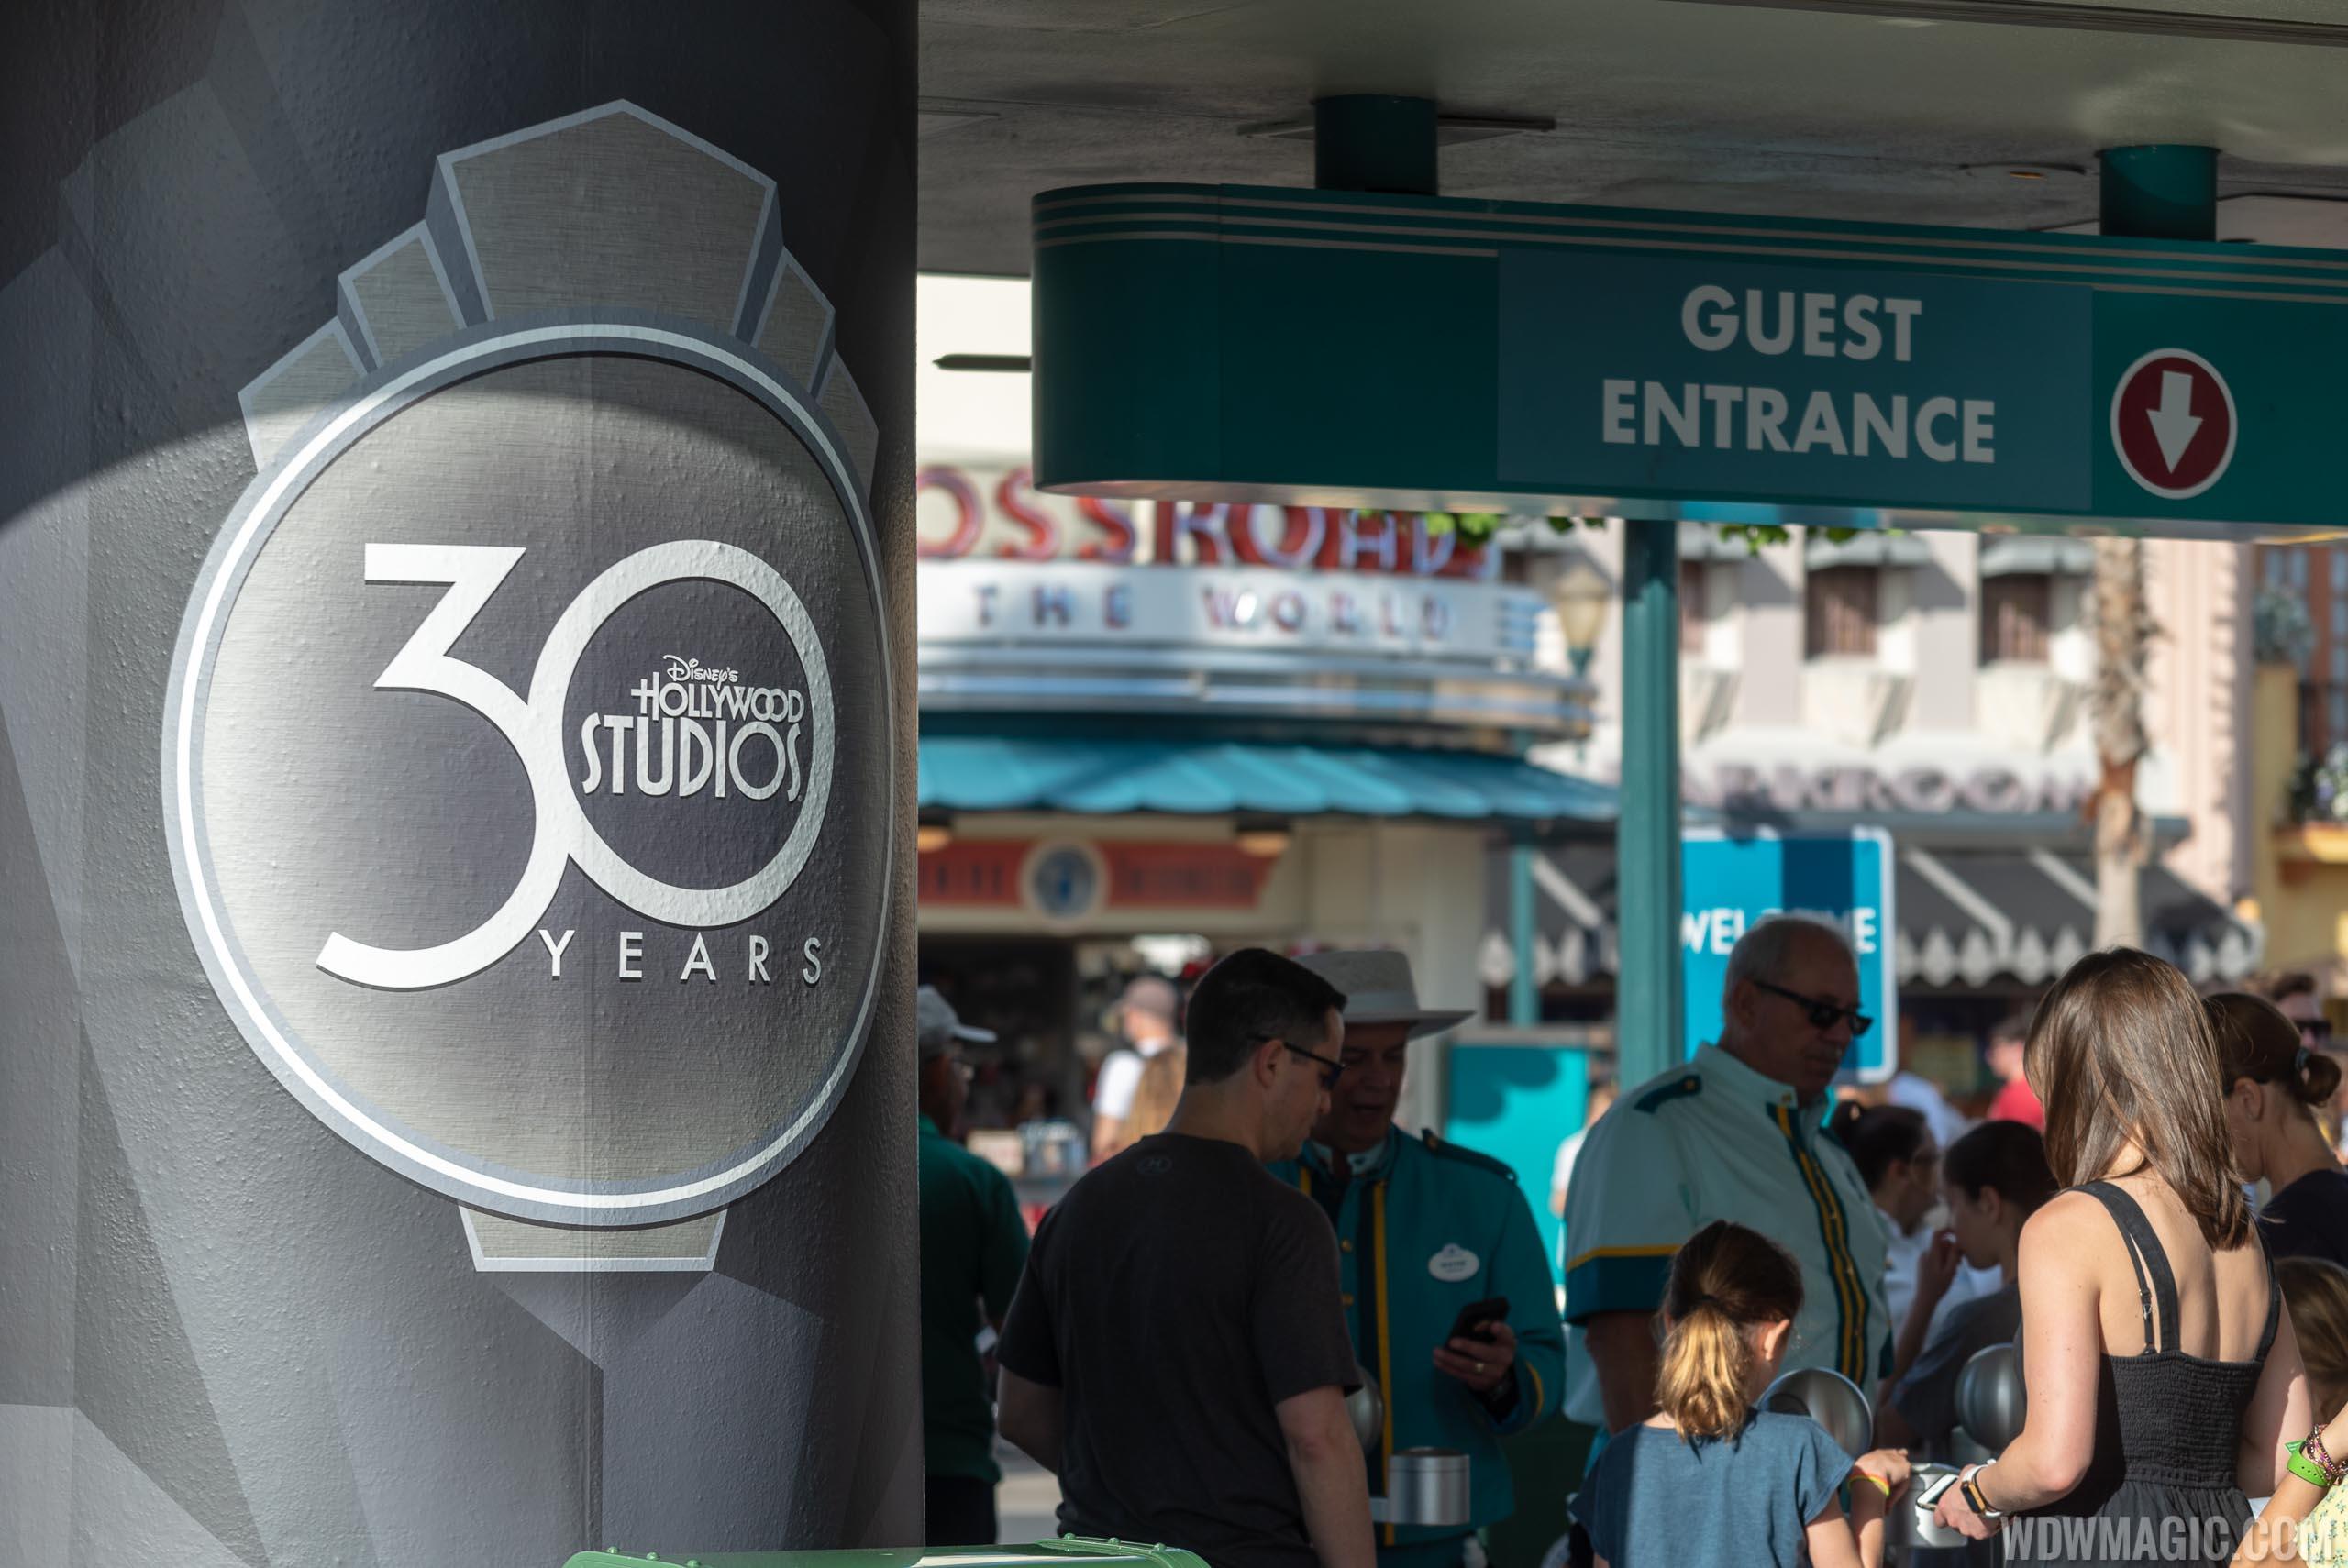 Disney's Hollywood Studios 30th Anniversary banners